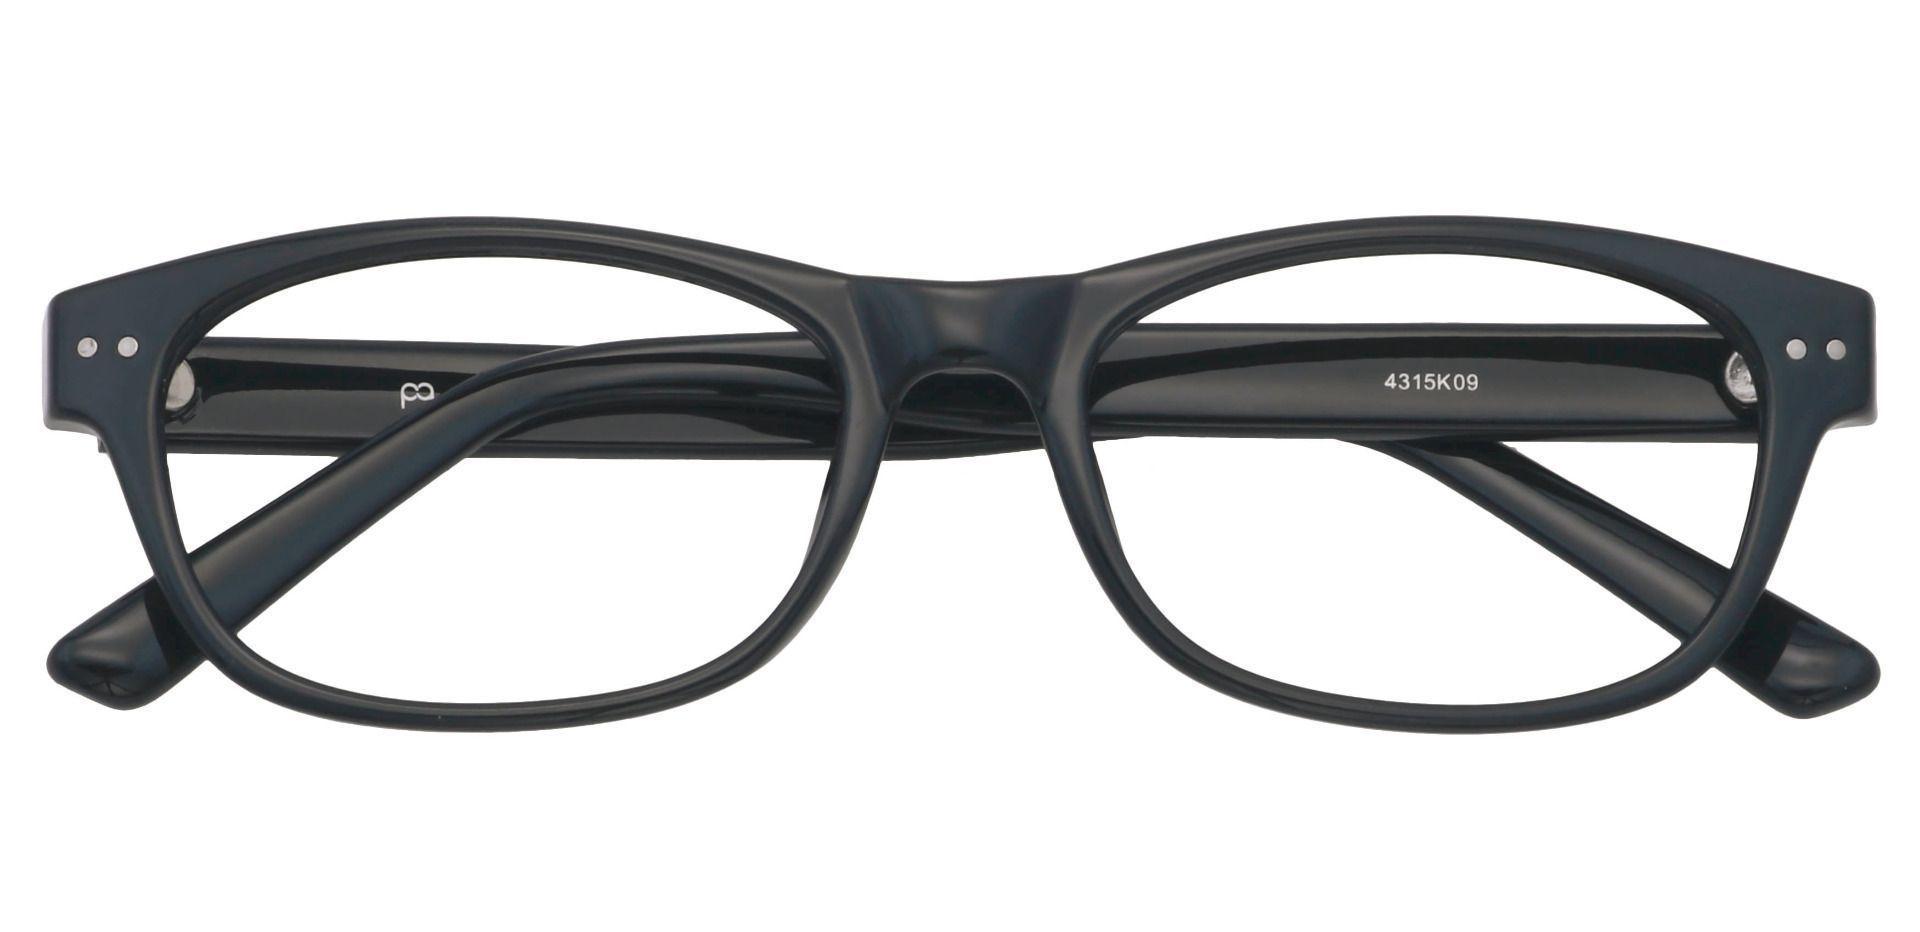 Gulf Rectangle Reading Glasses - Shiny Black